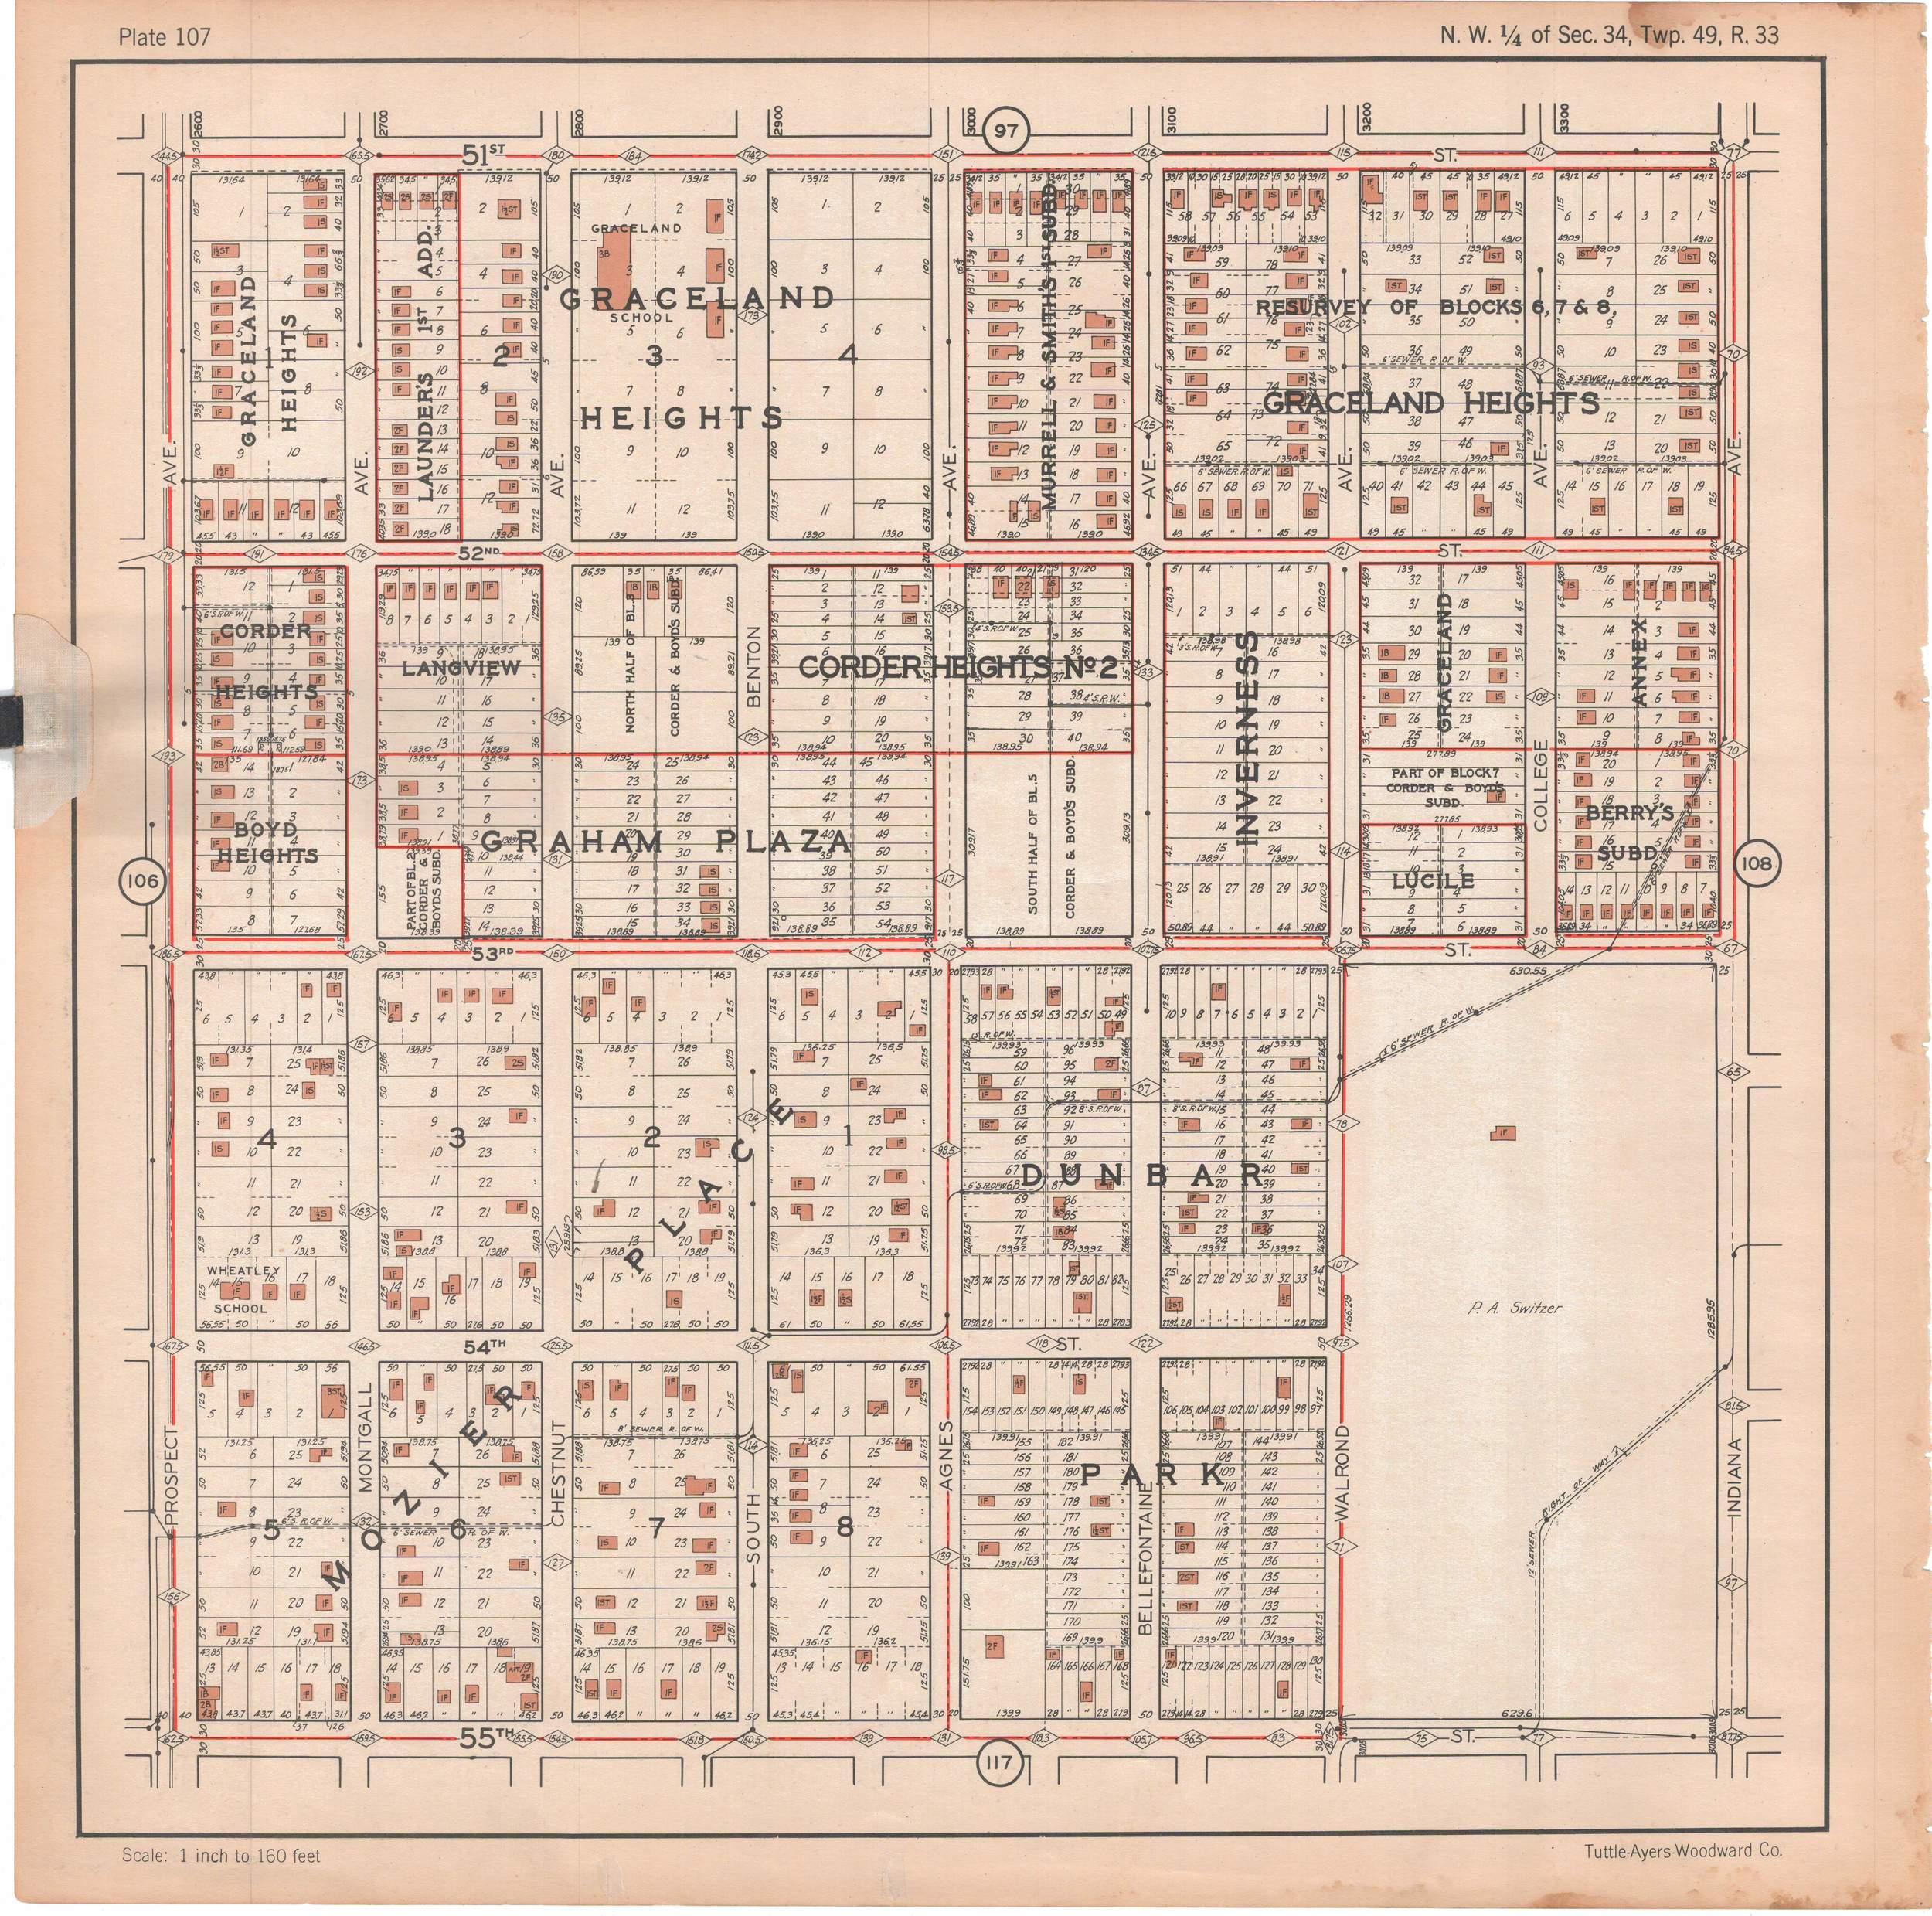 1925 TUTTLE_AYERS_Plate 107.JPG